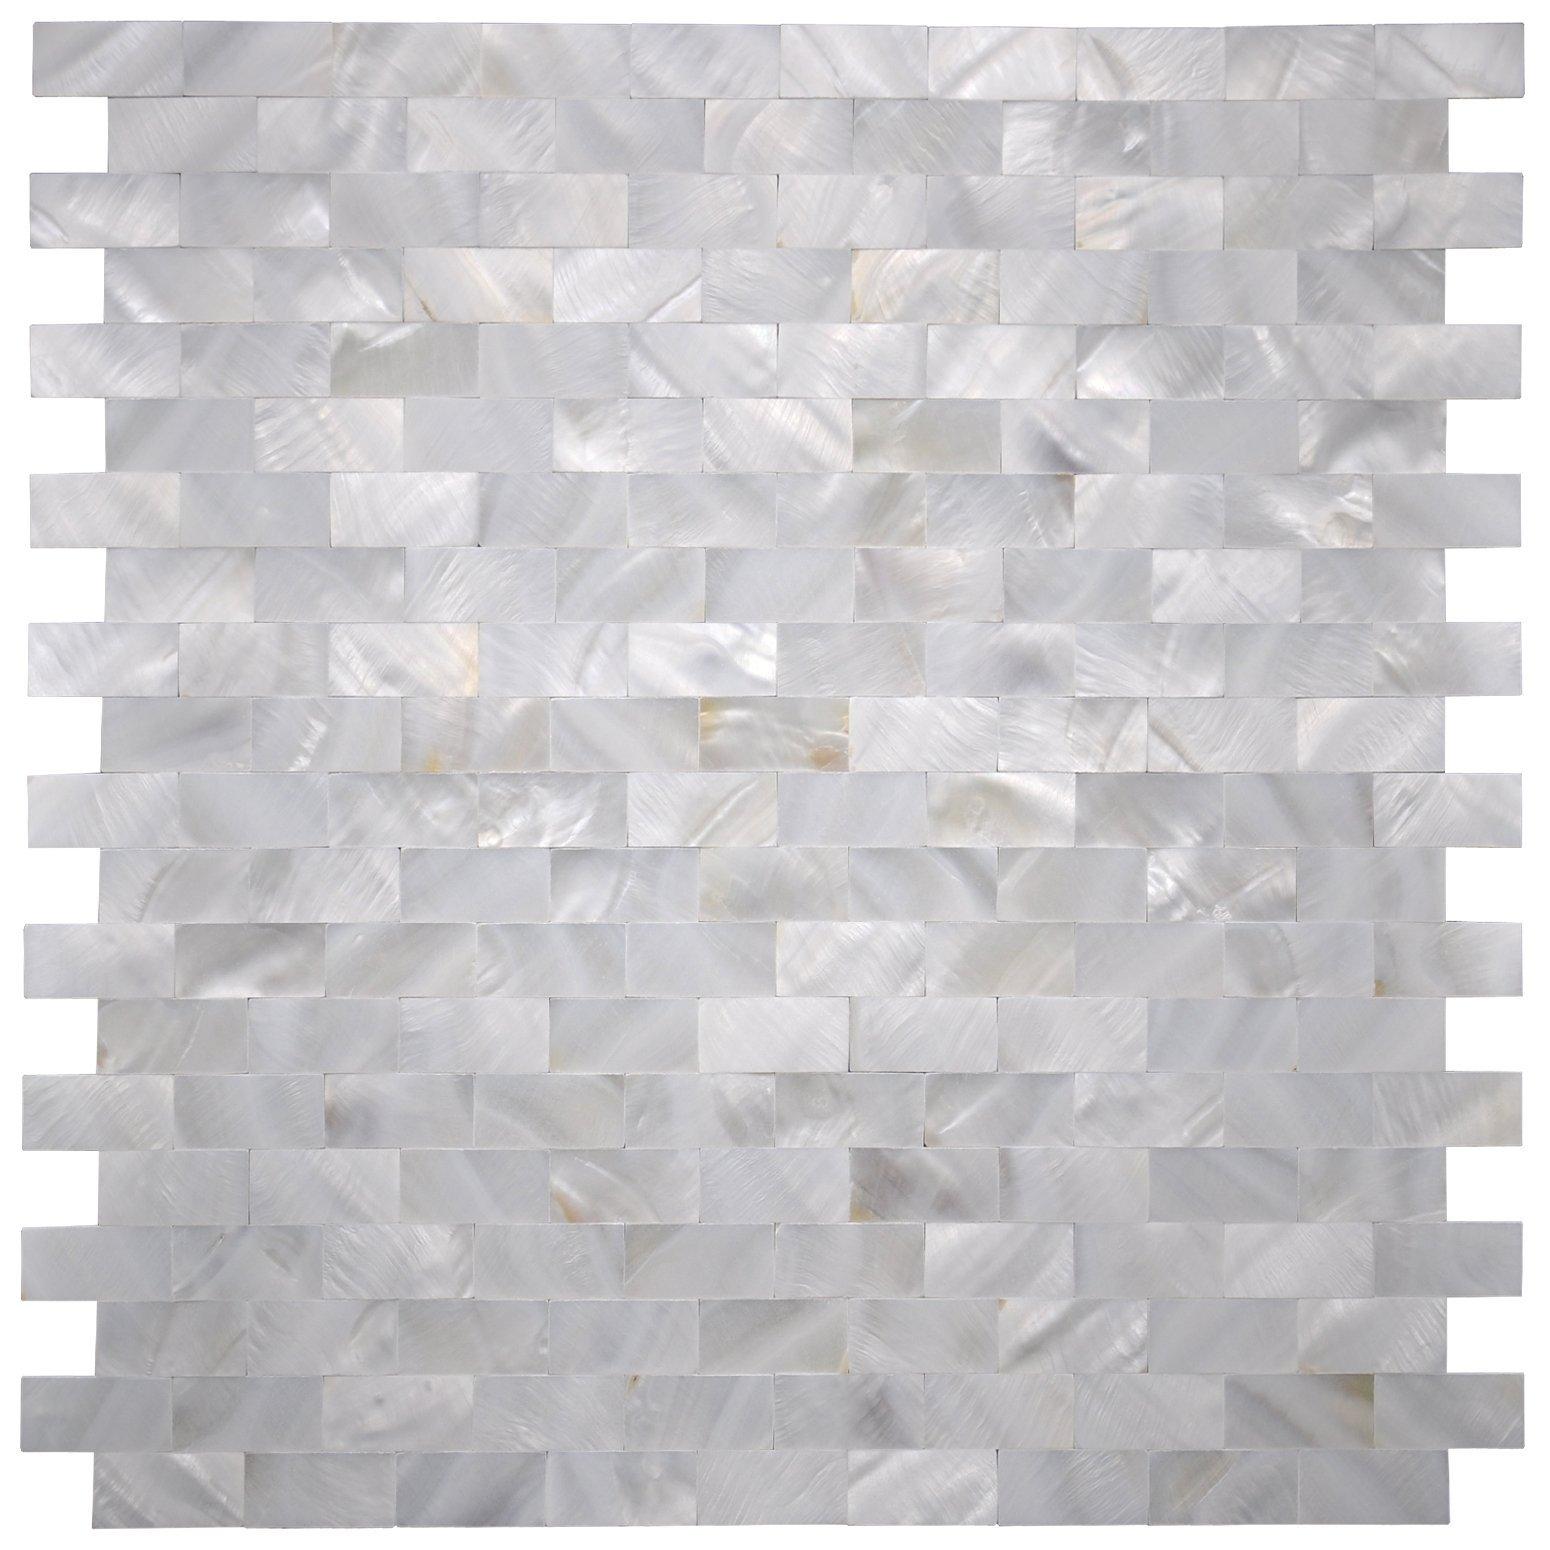 Art3d 6-Pack White MOP Shell Mosaic Tile for Kitchen Backsplashes/Shower Wall, 12'' x 12'' Groutless Subway